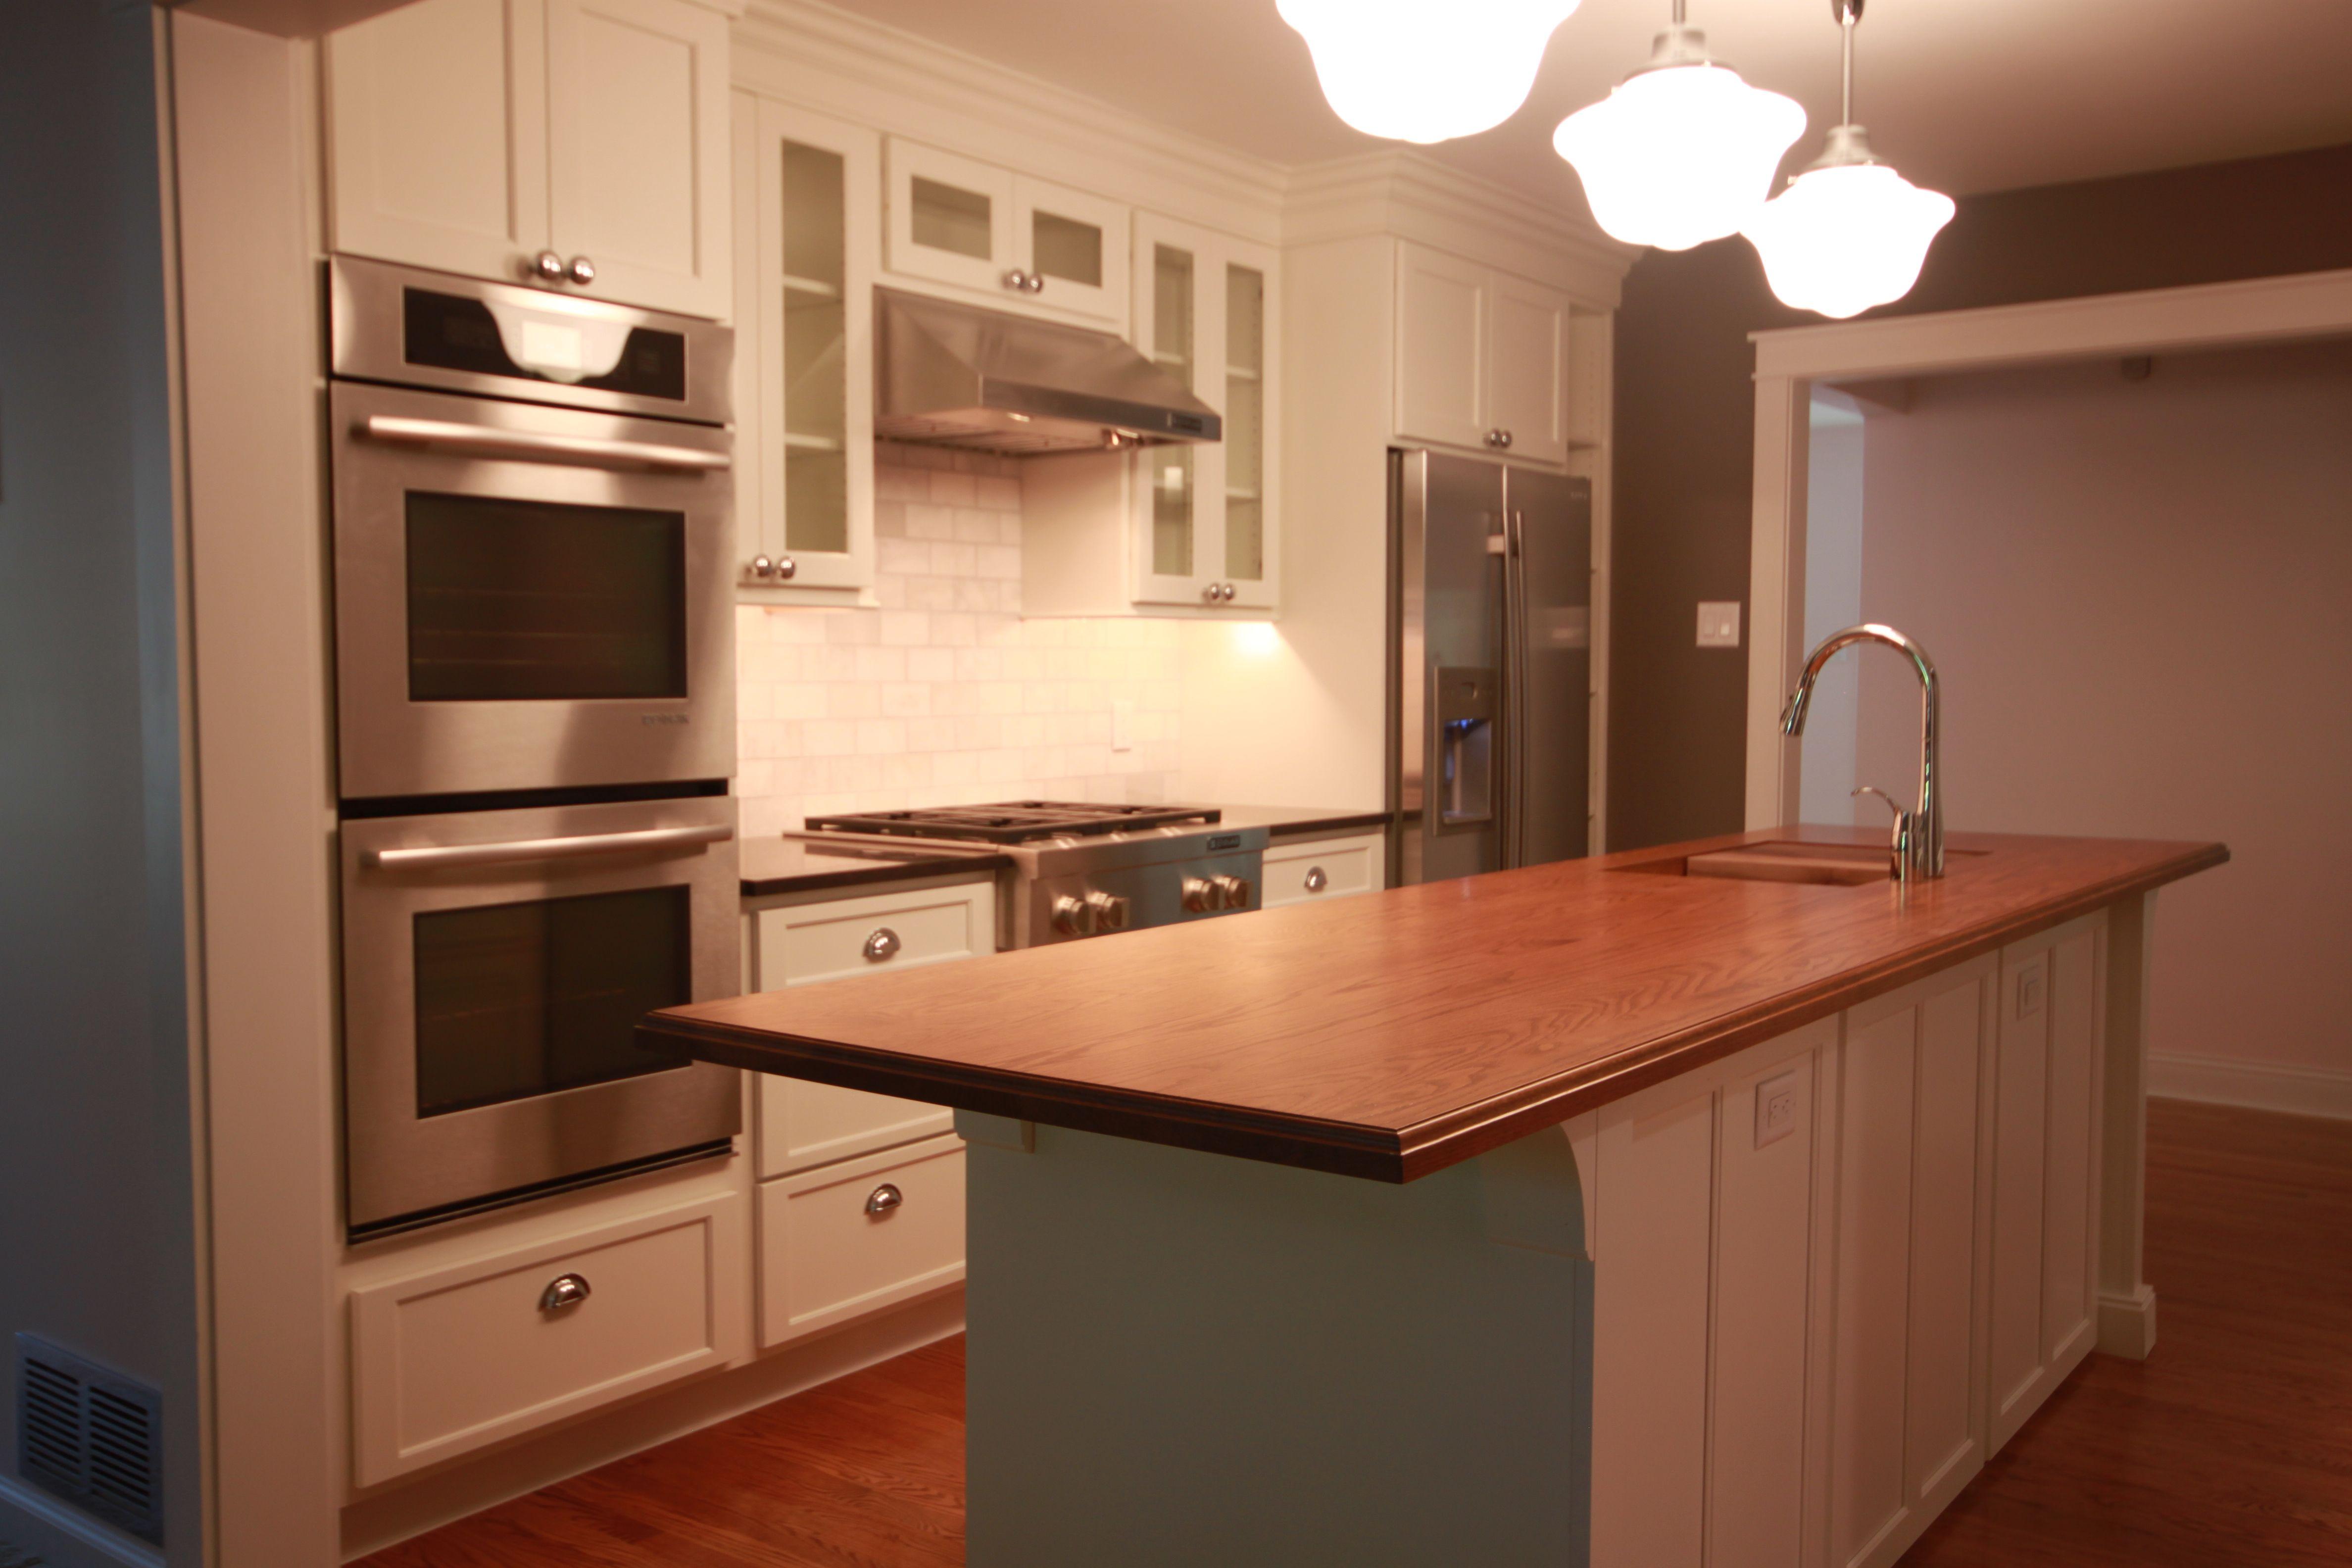 Liston Construction Company | Kitchen Remodel | LCC Kitchen Remodels ...